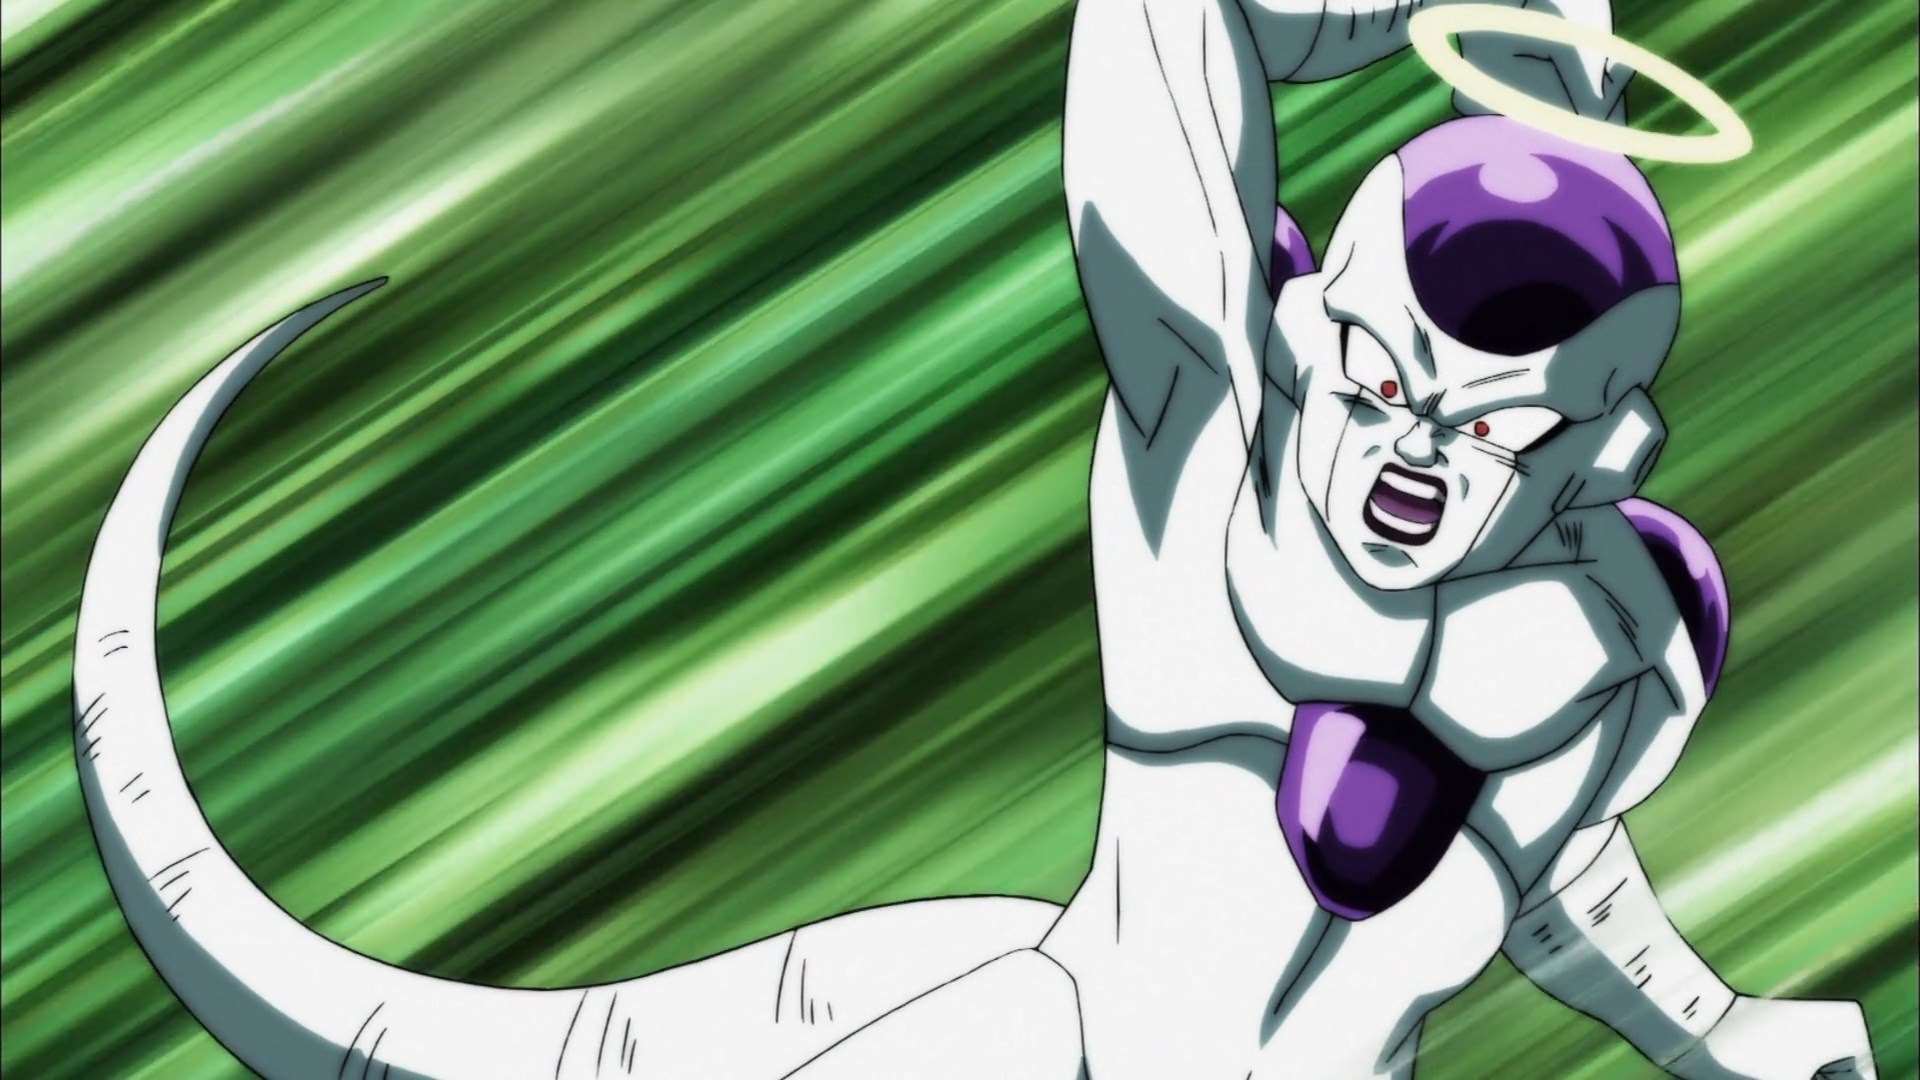 [HorribleSubs] Dragon Ball Super - 121 [1080p].mkv_snapshot_12.56